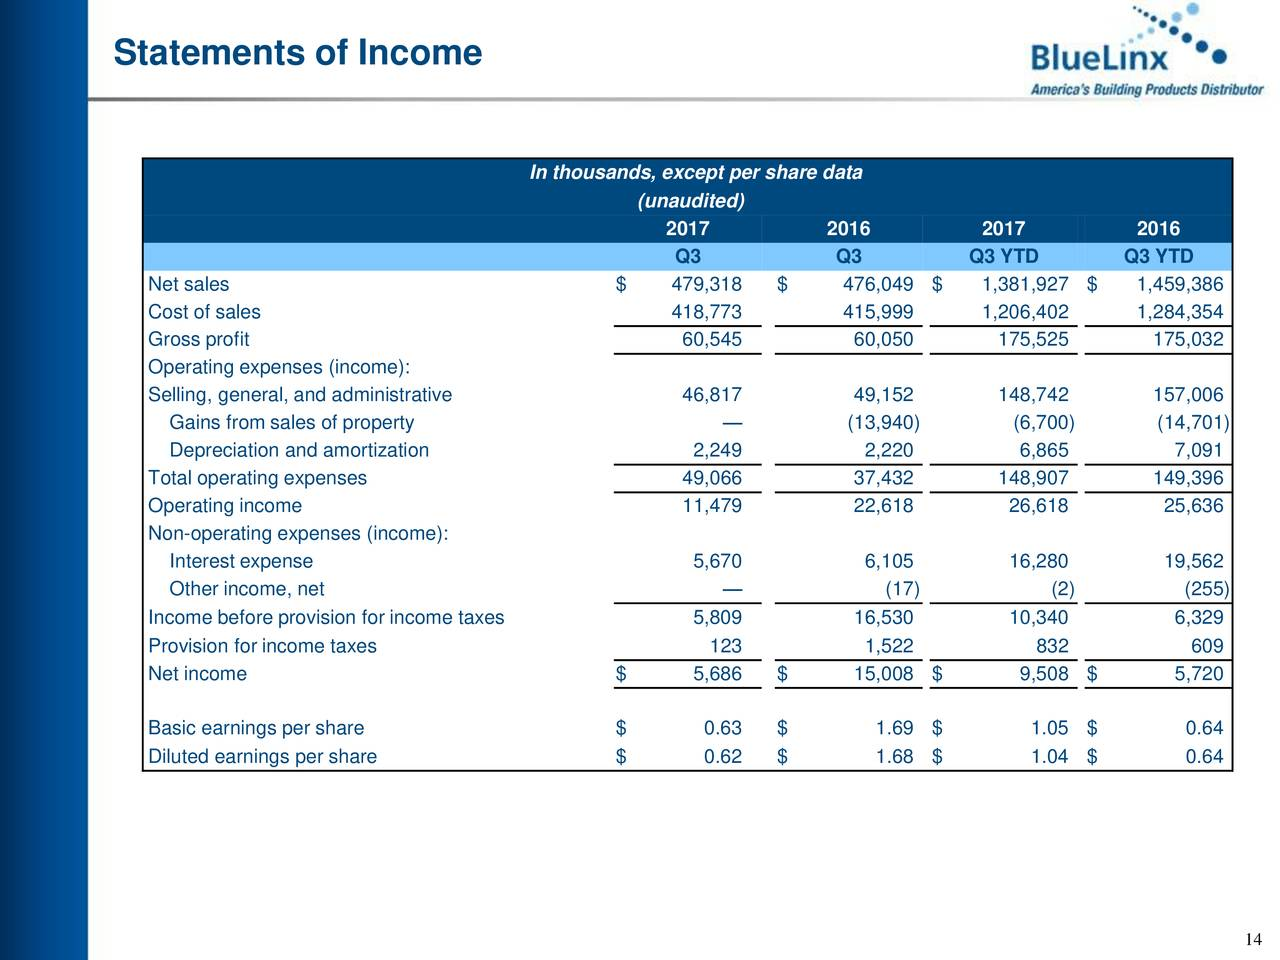 BlueLinx Holdings, Inc. 2017 Q3